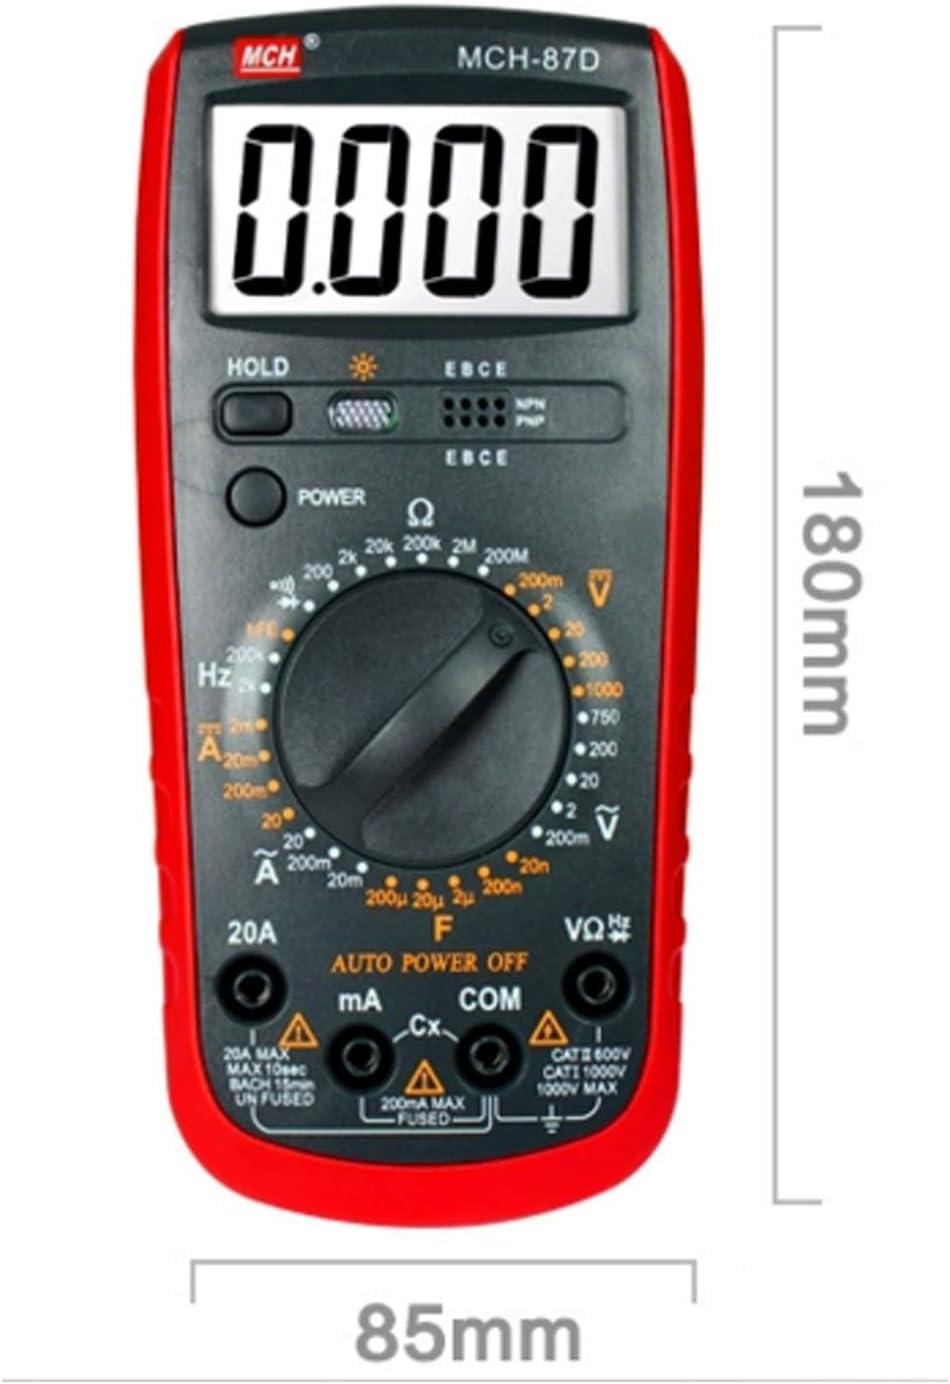 EODUDO-Tester Four and a Half Digital Multimeter Handheld High-Pressure Anti-Burning Universal Strap Table Pen MCH-87D,Precision Measurement